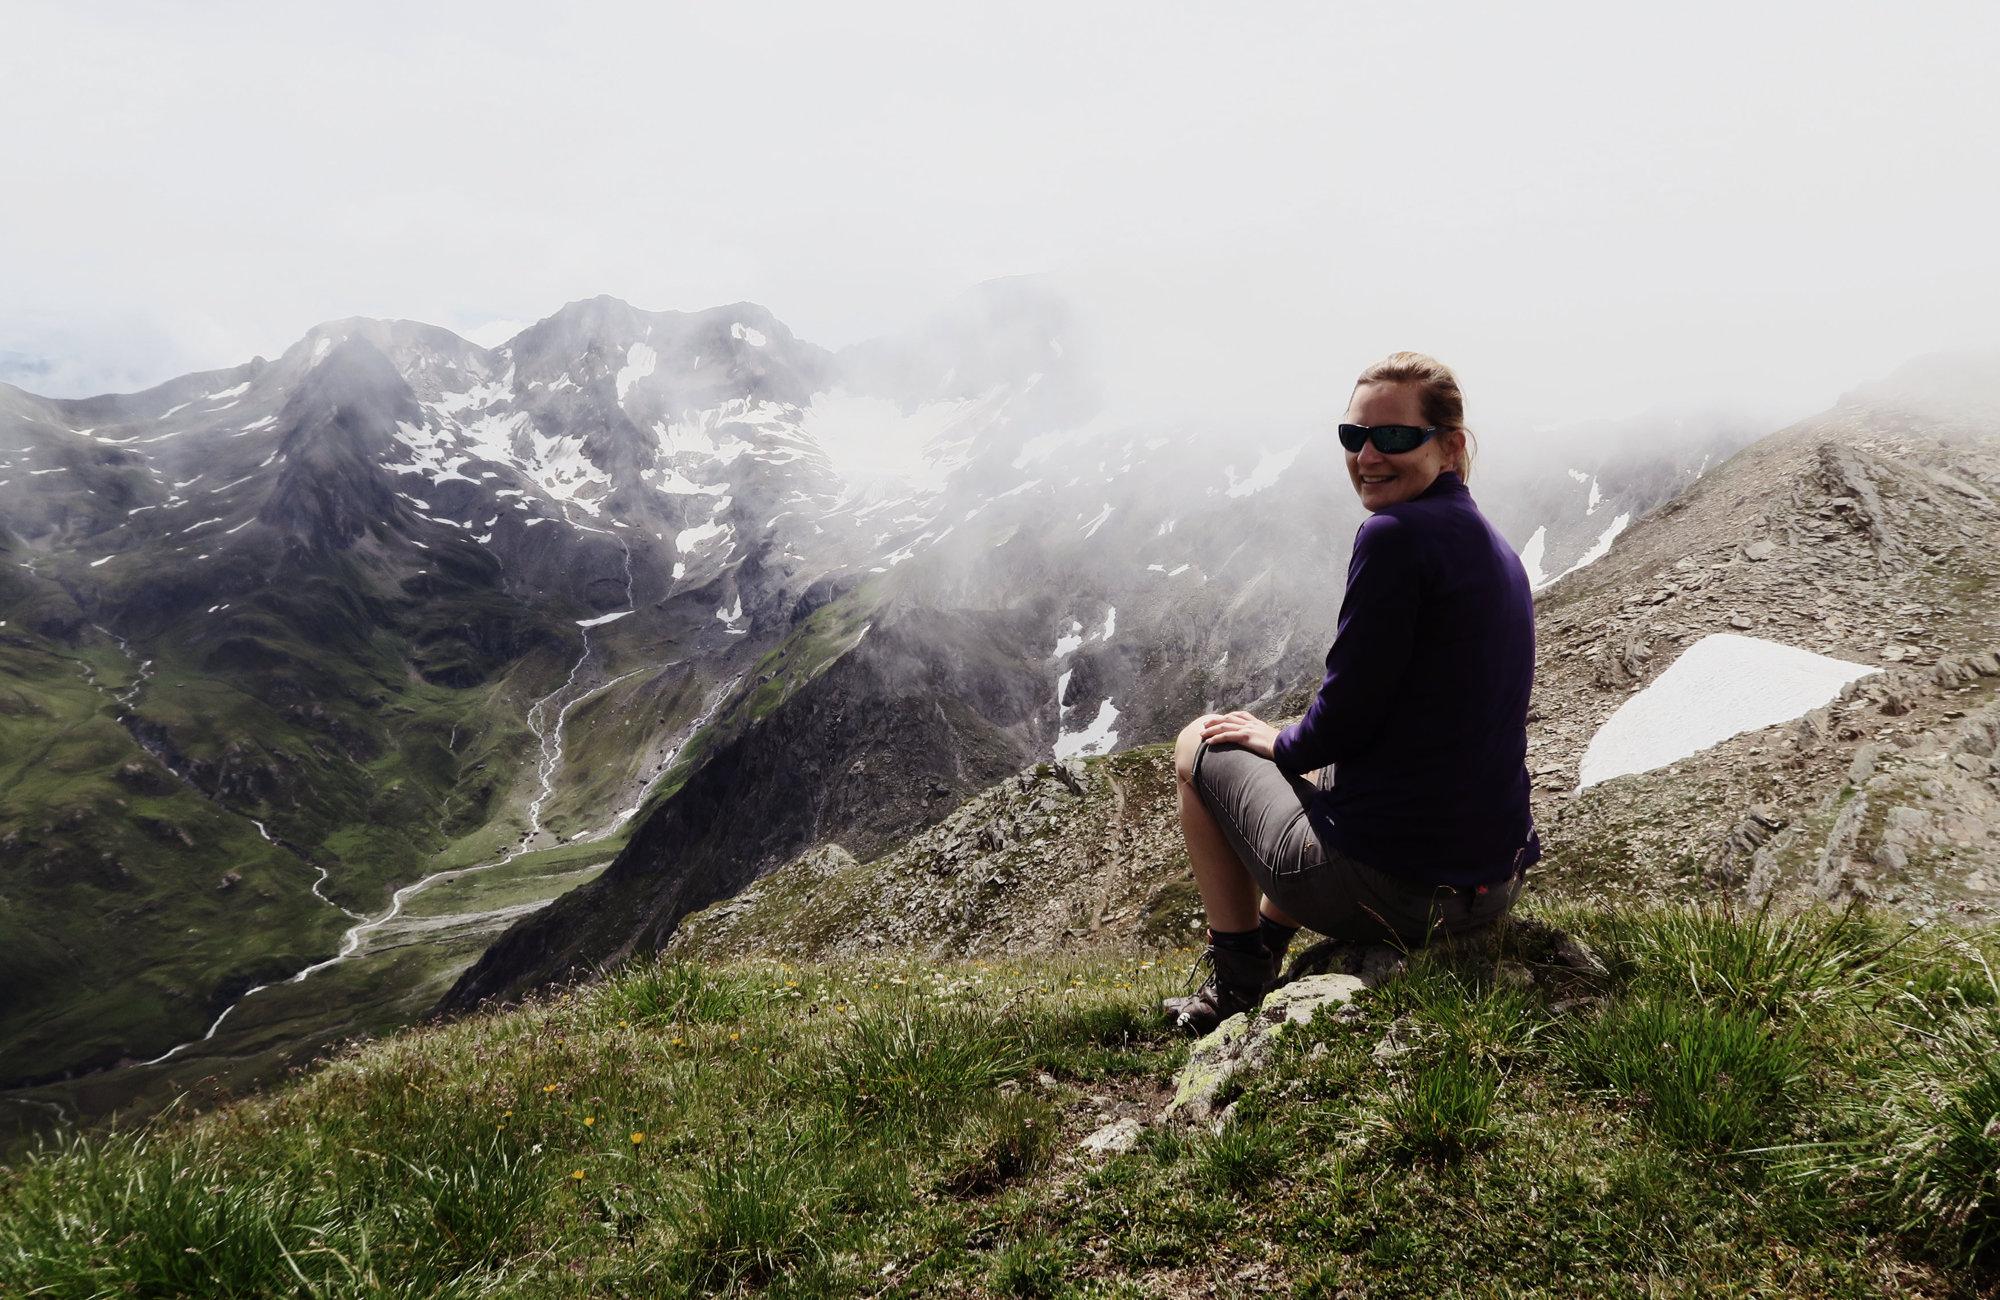 Auf dem Königsjoch, Wanderung Königsjoch, Obergurgl nach Südtirol, Bergwandern Ötztal, Wandertour Ötztal, Stubaier Alpen, Tirol